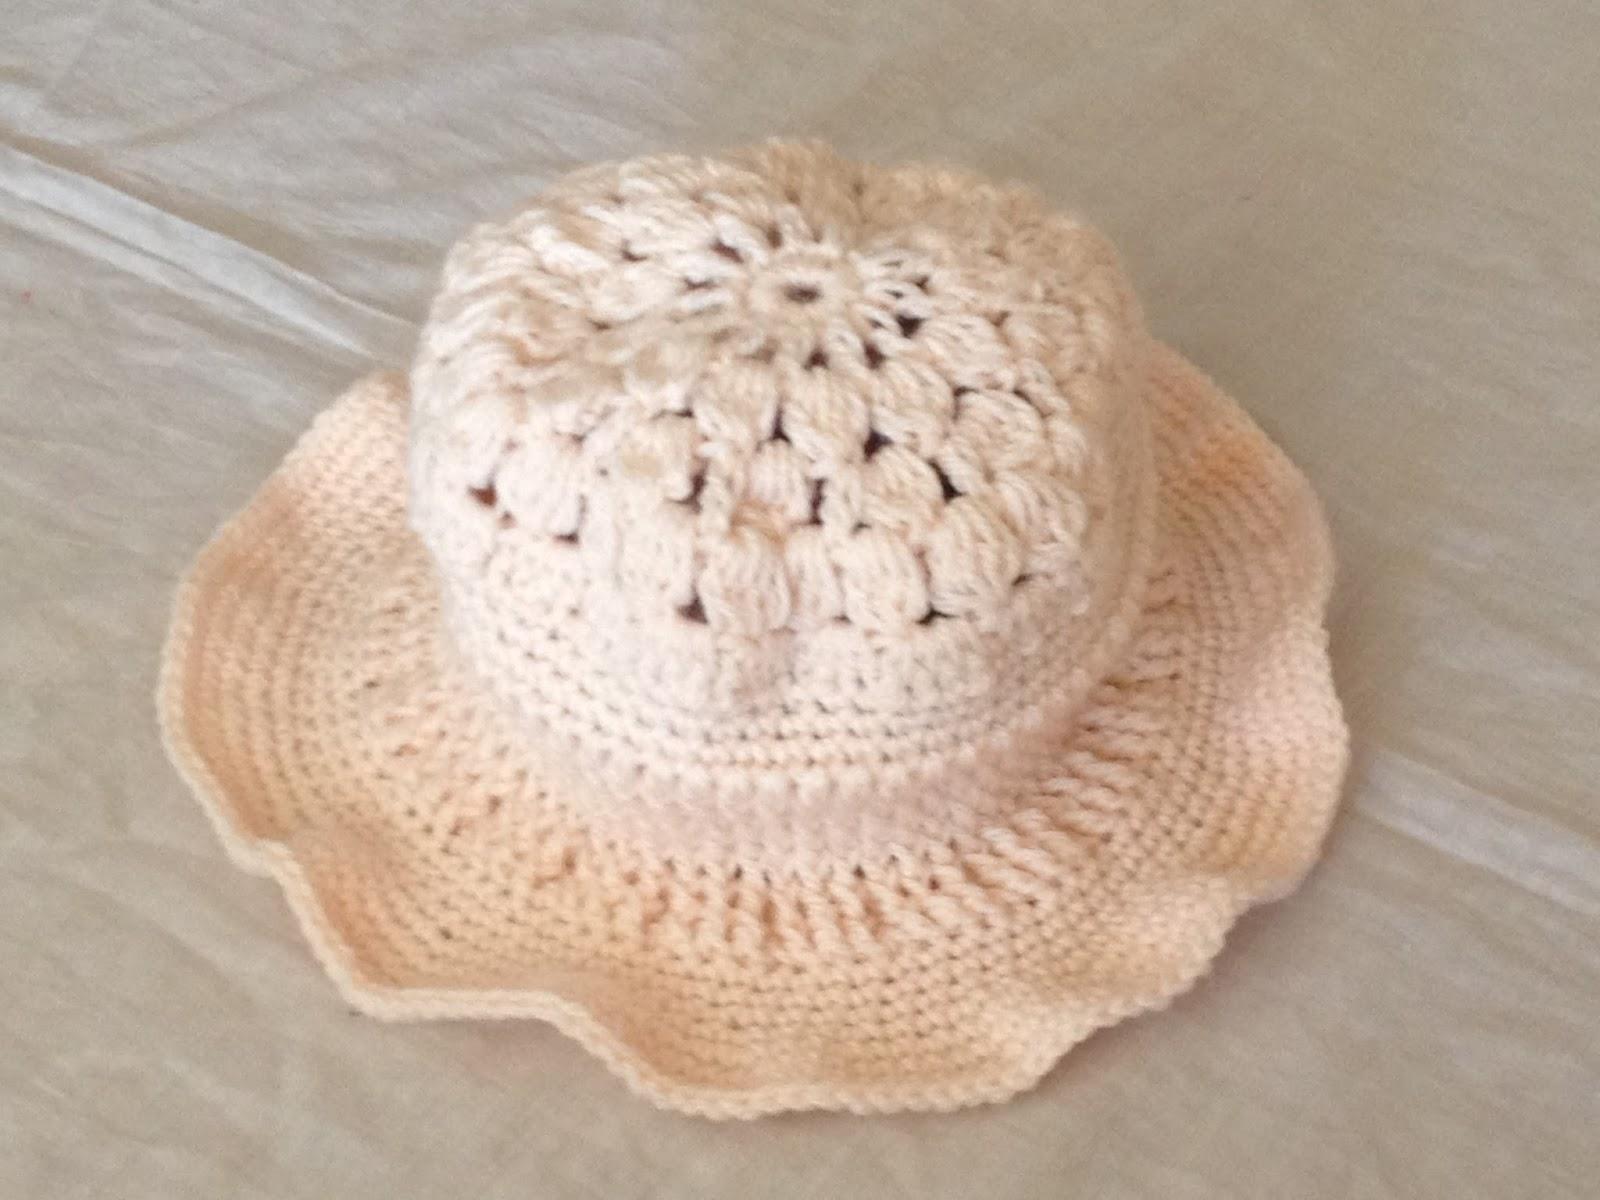 Crochet Fptr : tr dc double crochet tr treble crochet htr half treble crochet fptr ...